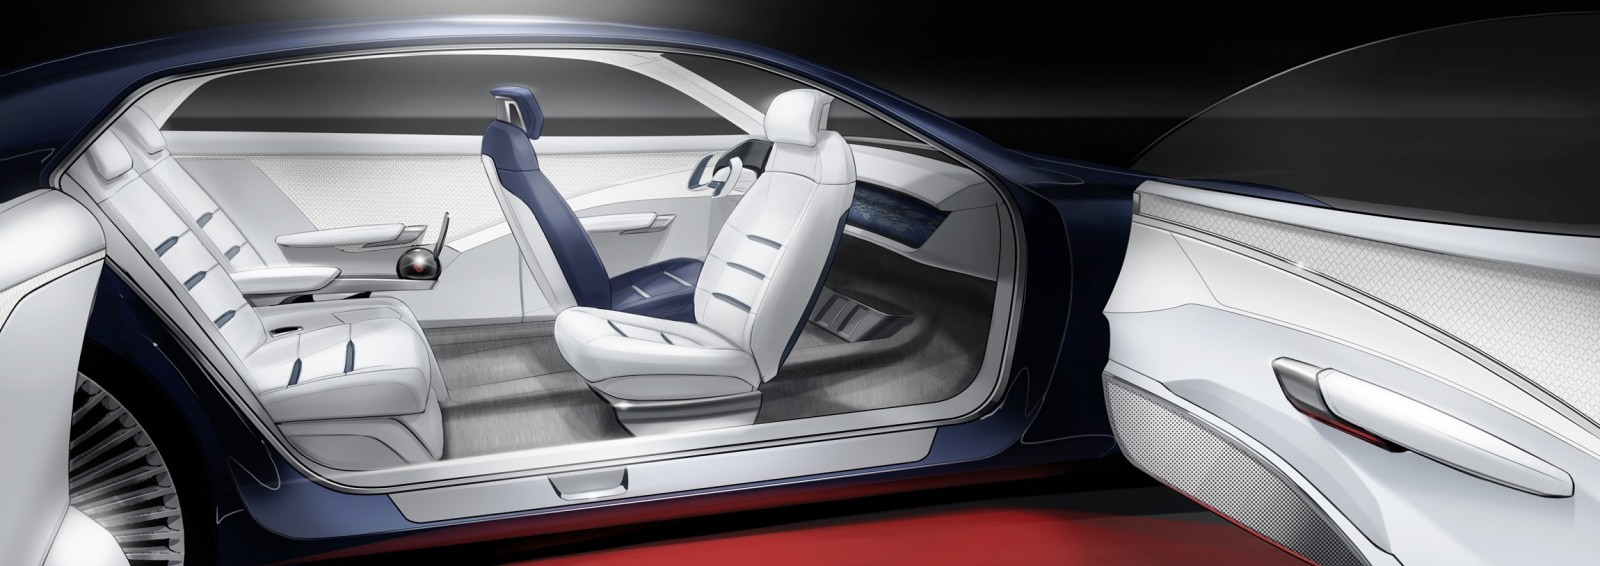 2015 ItalDesign Giugiaro GEA Concept 18